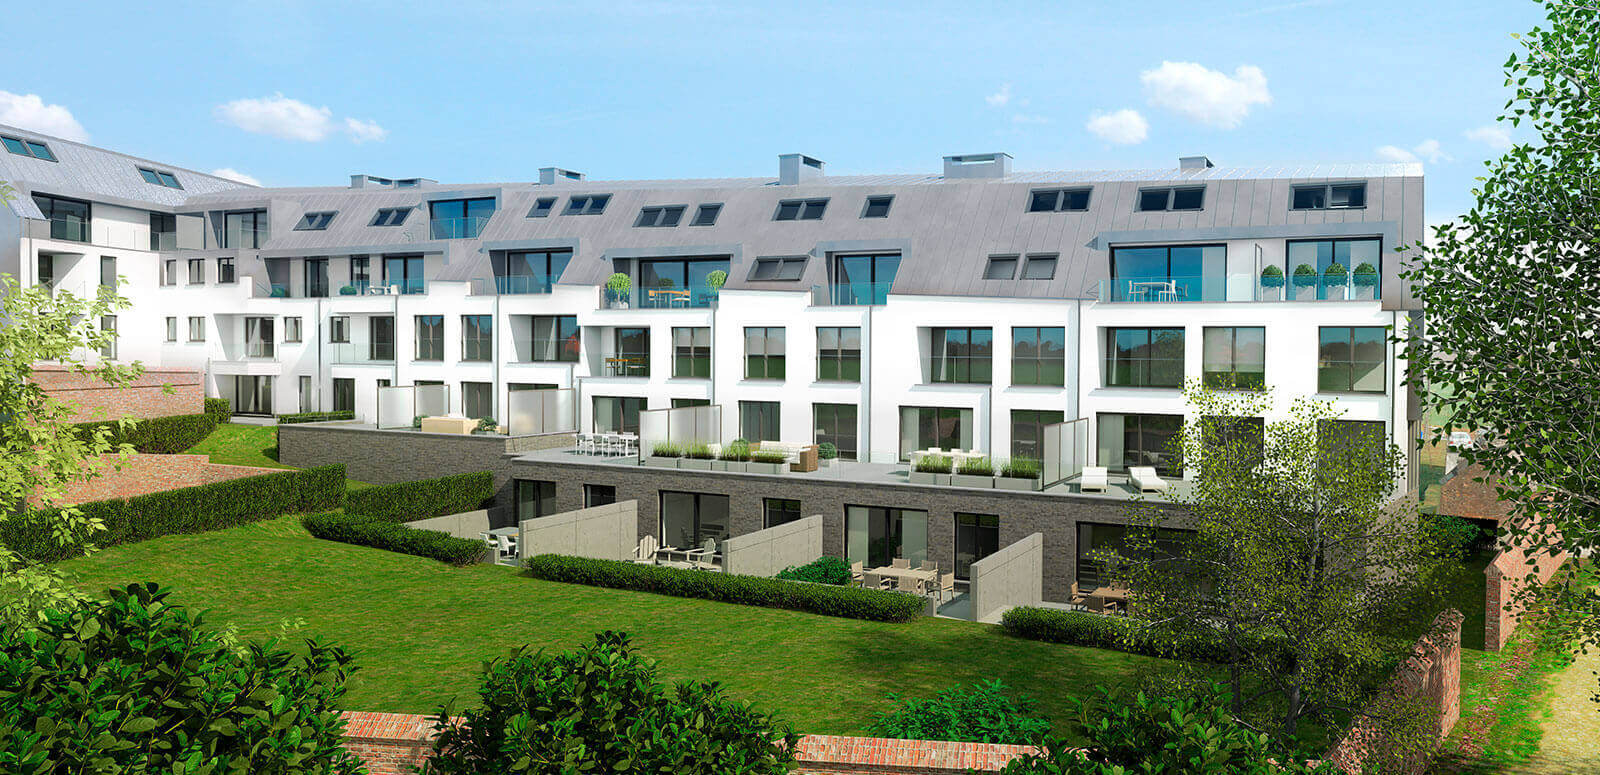 Robert Lariellestraat - Brusselsesteenweg, 1500 Halle